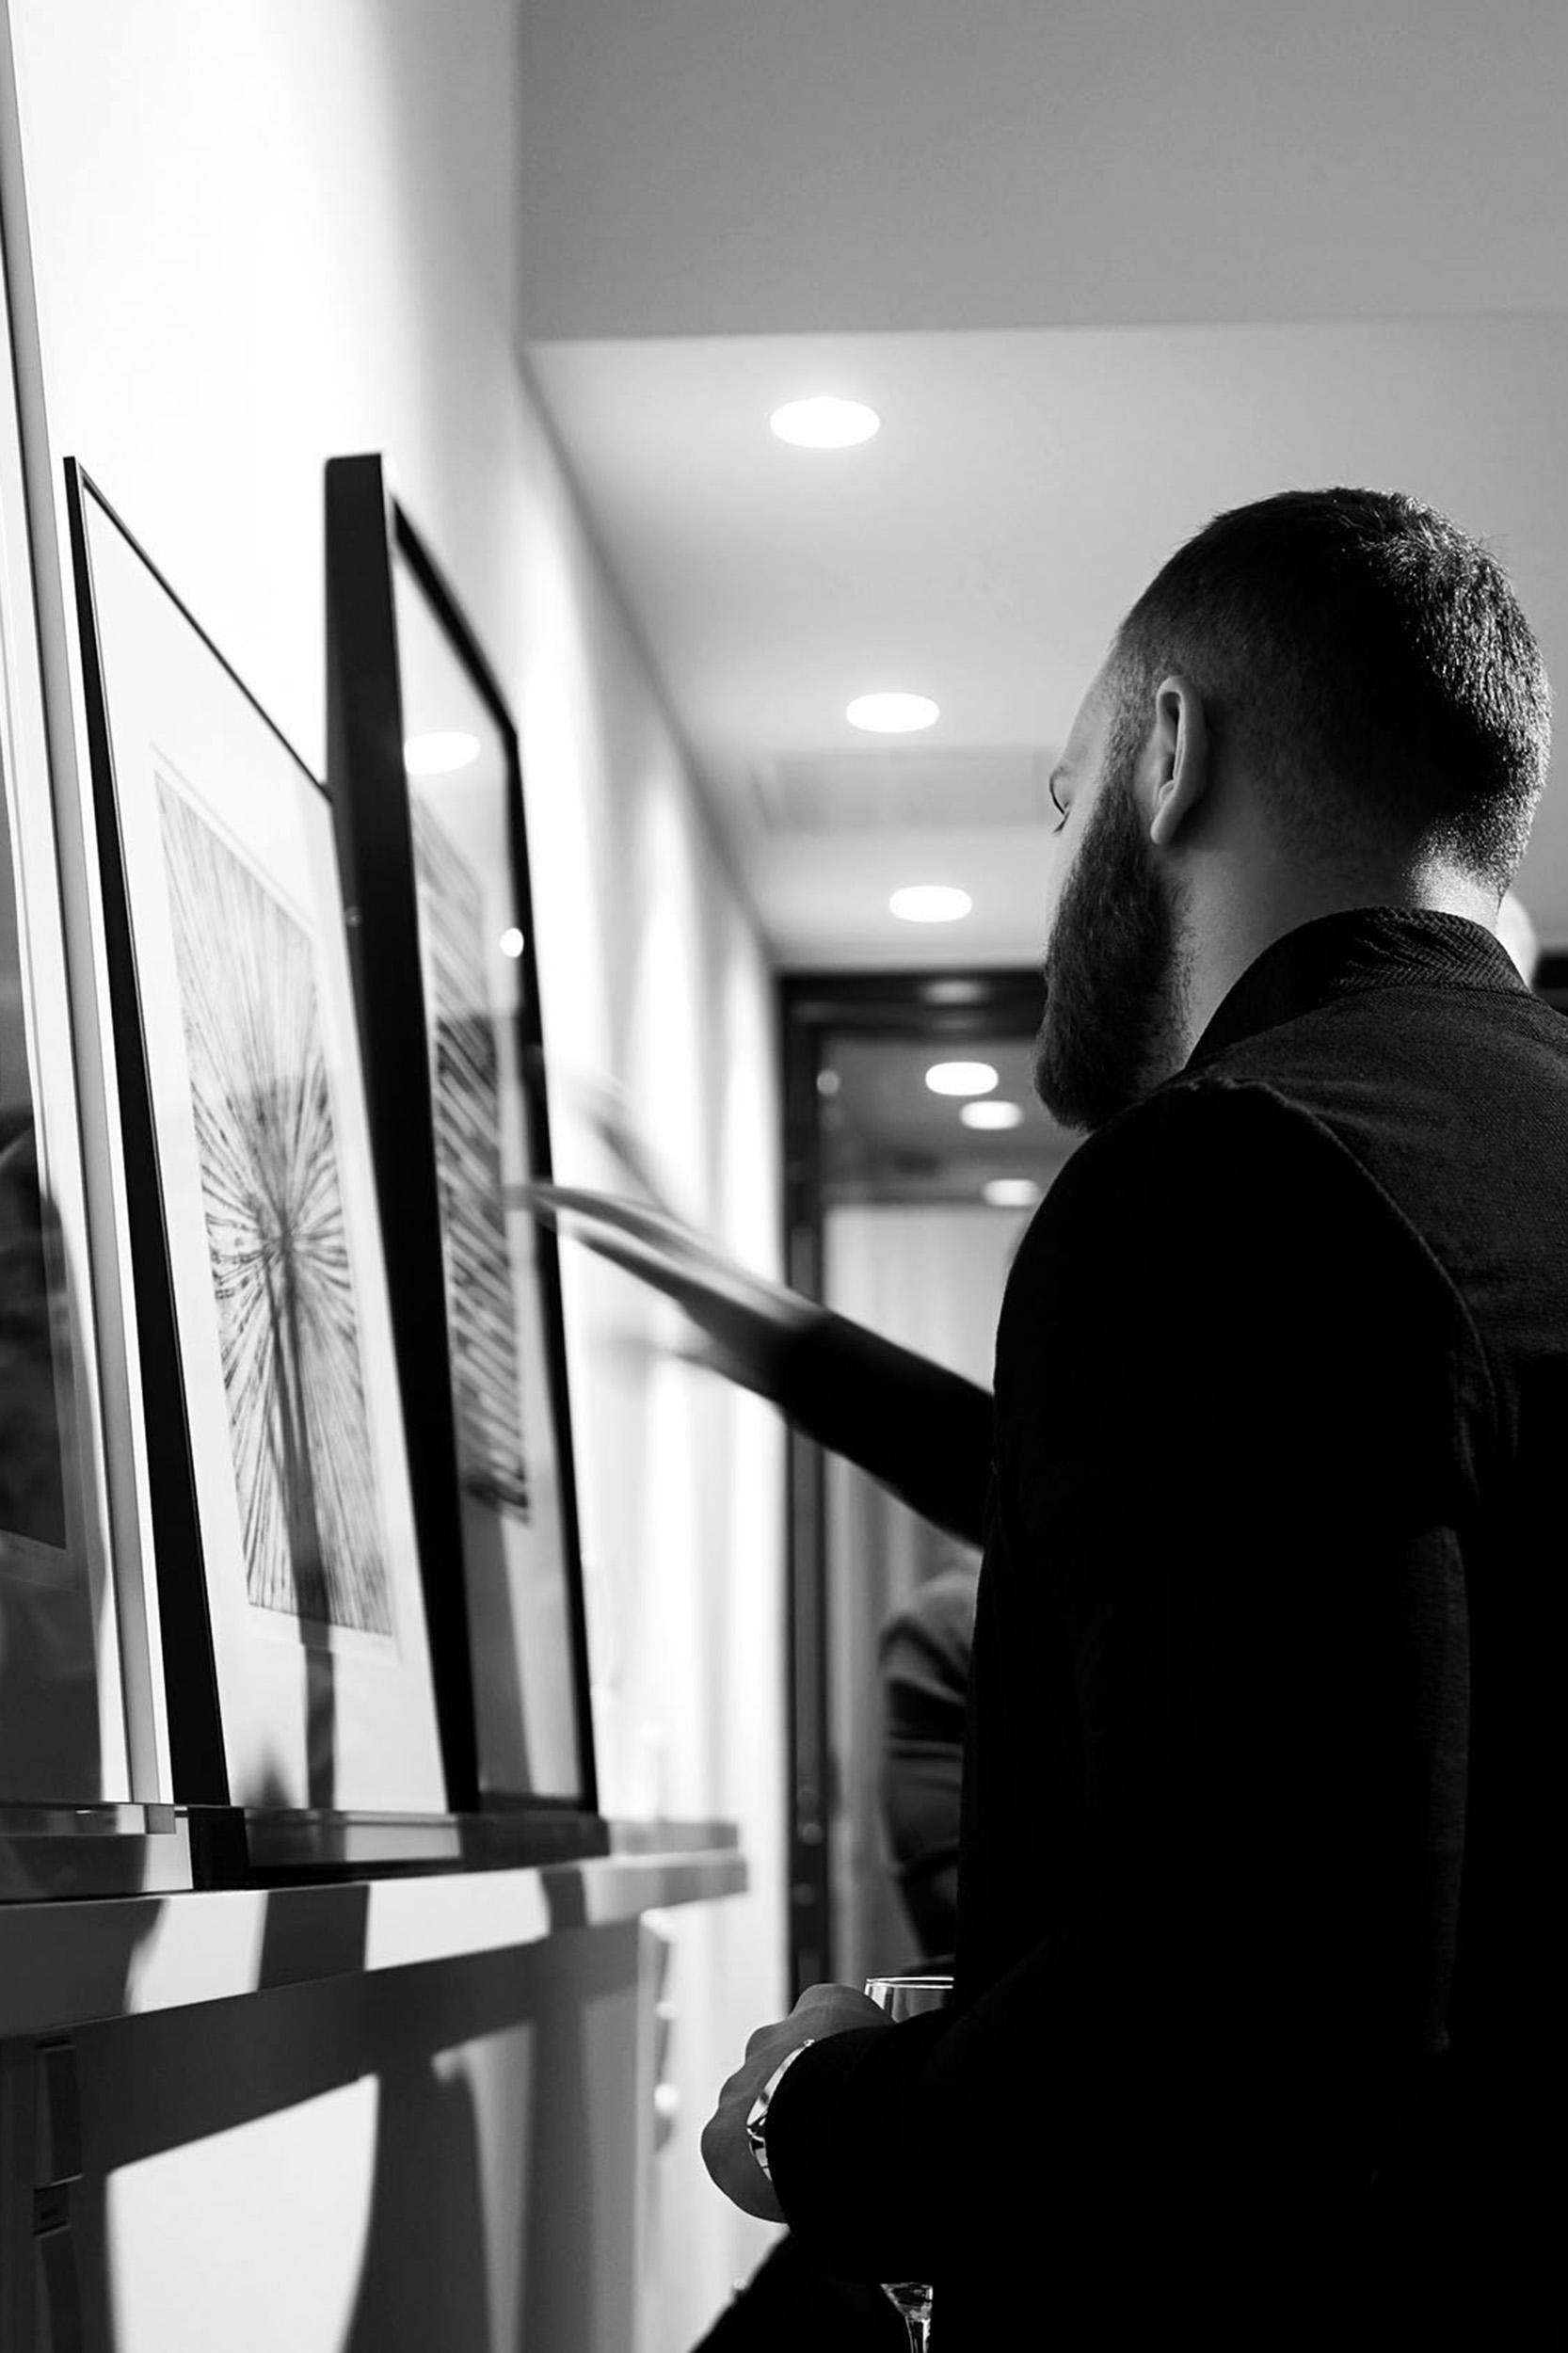 Browsing for art